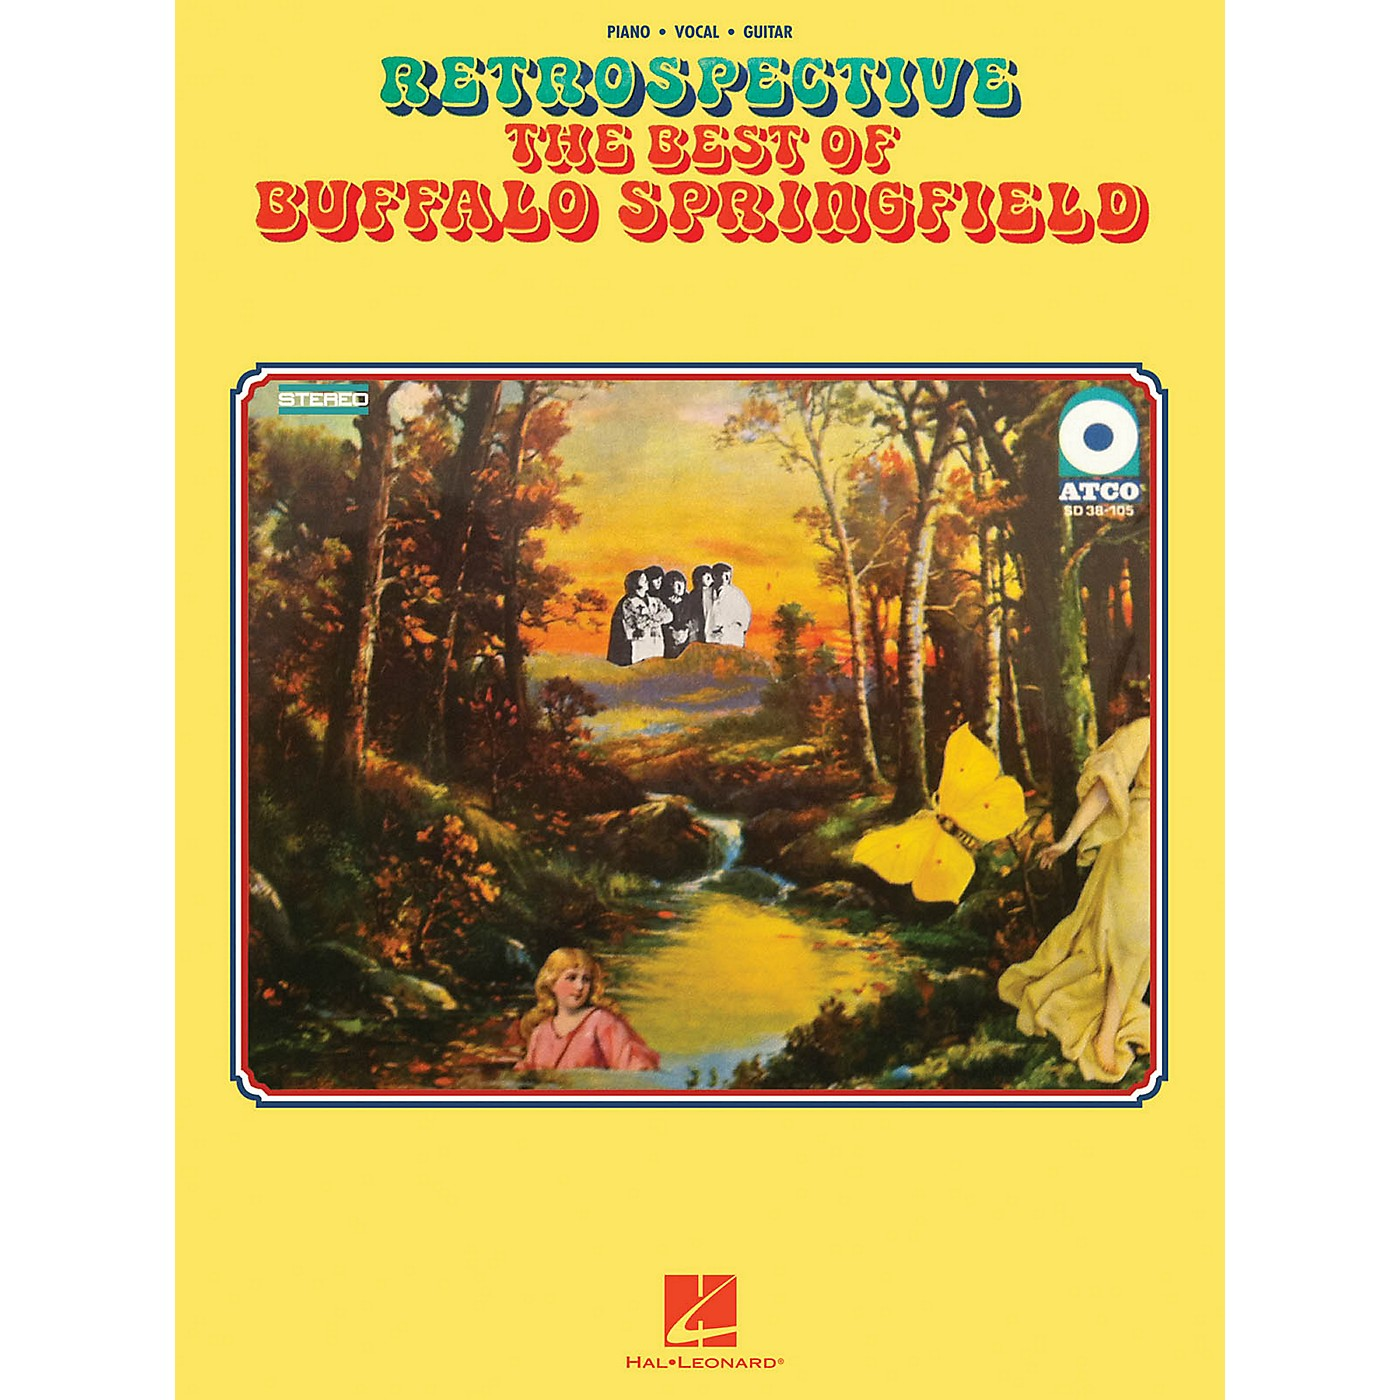 Hal Leonard Retrospective - The Best of Buffalo Springfield for Piano/Vocal/Guitar thumbnail